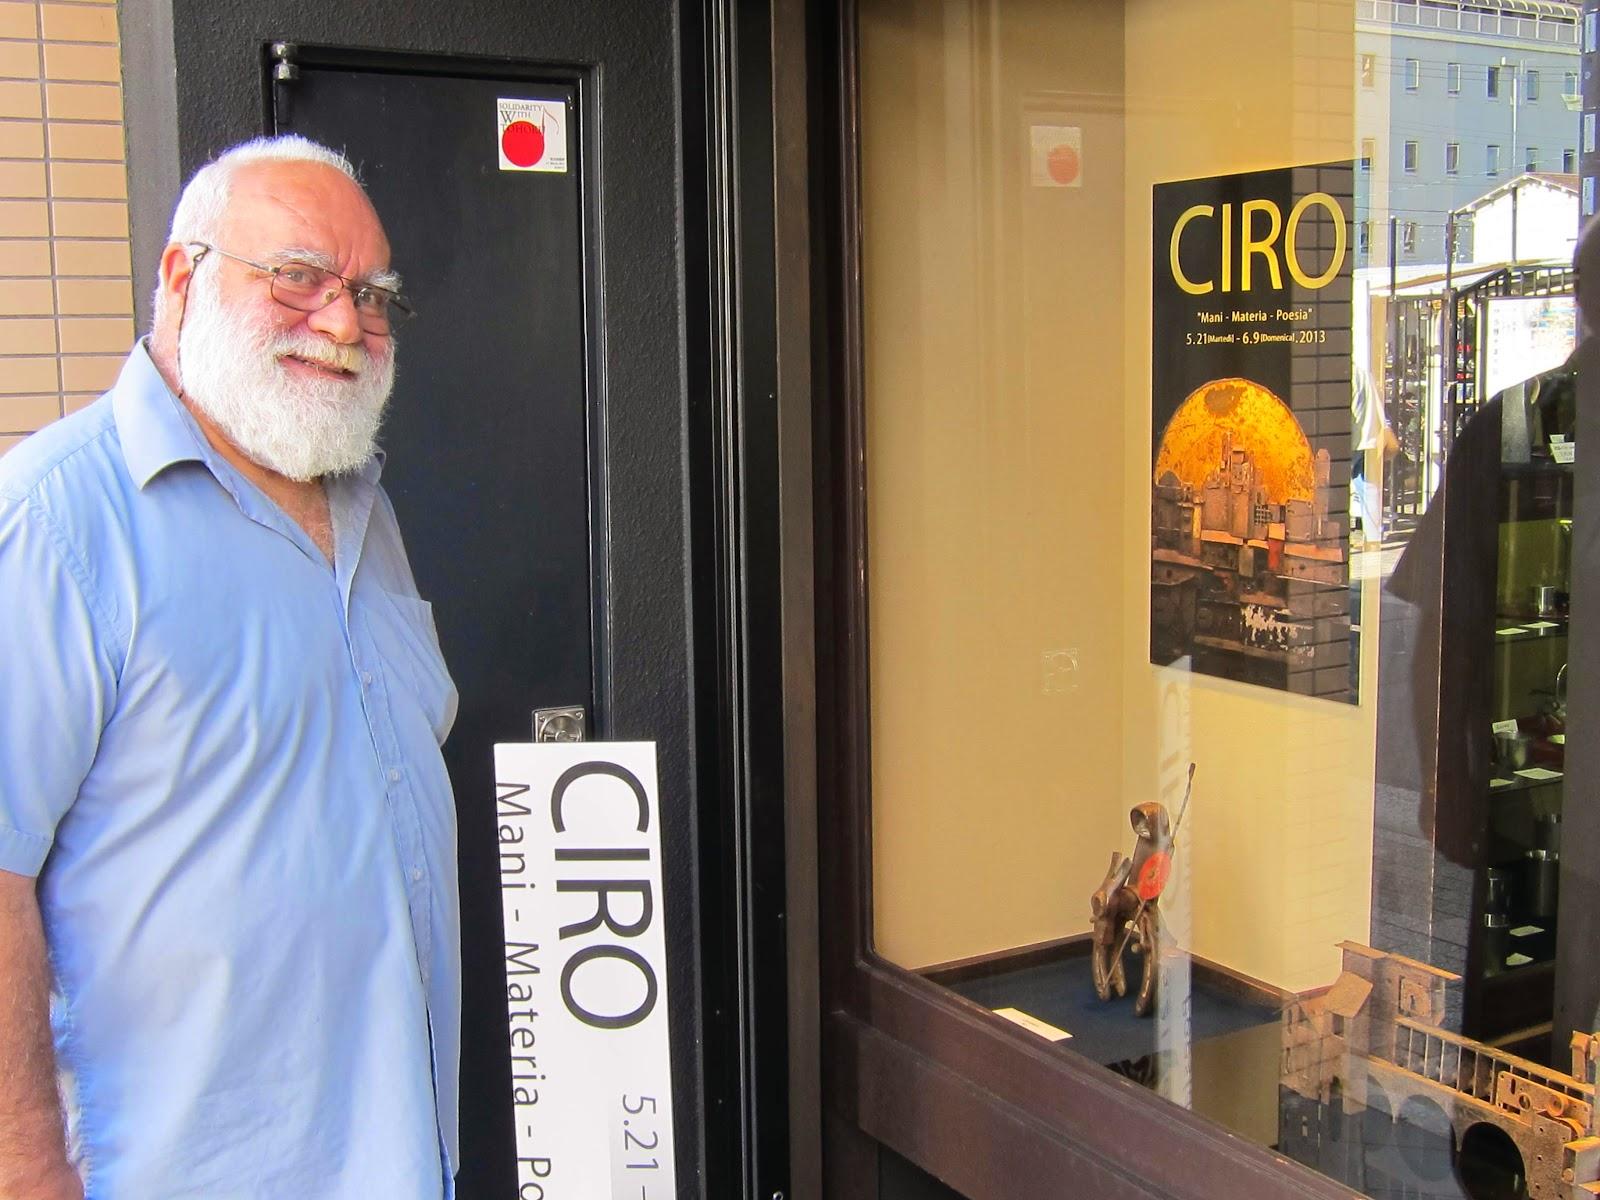 Roberto Ciro Mani Materia Poesia in Kyoto, Japan